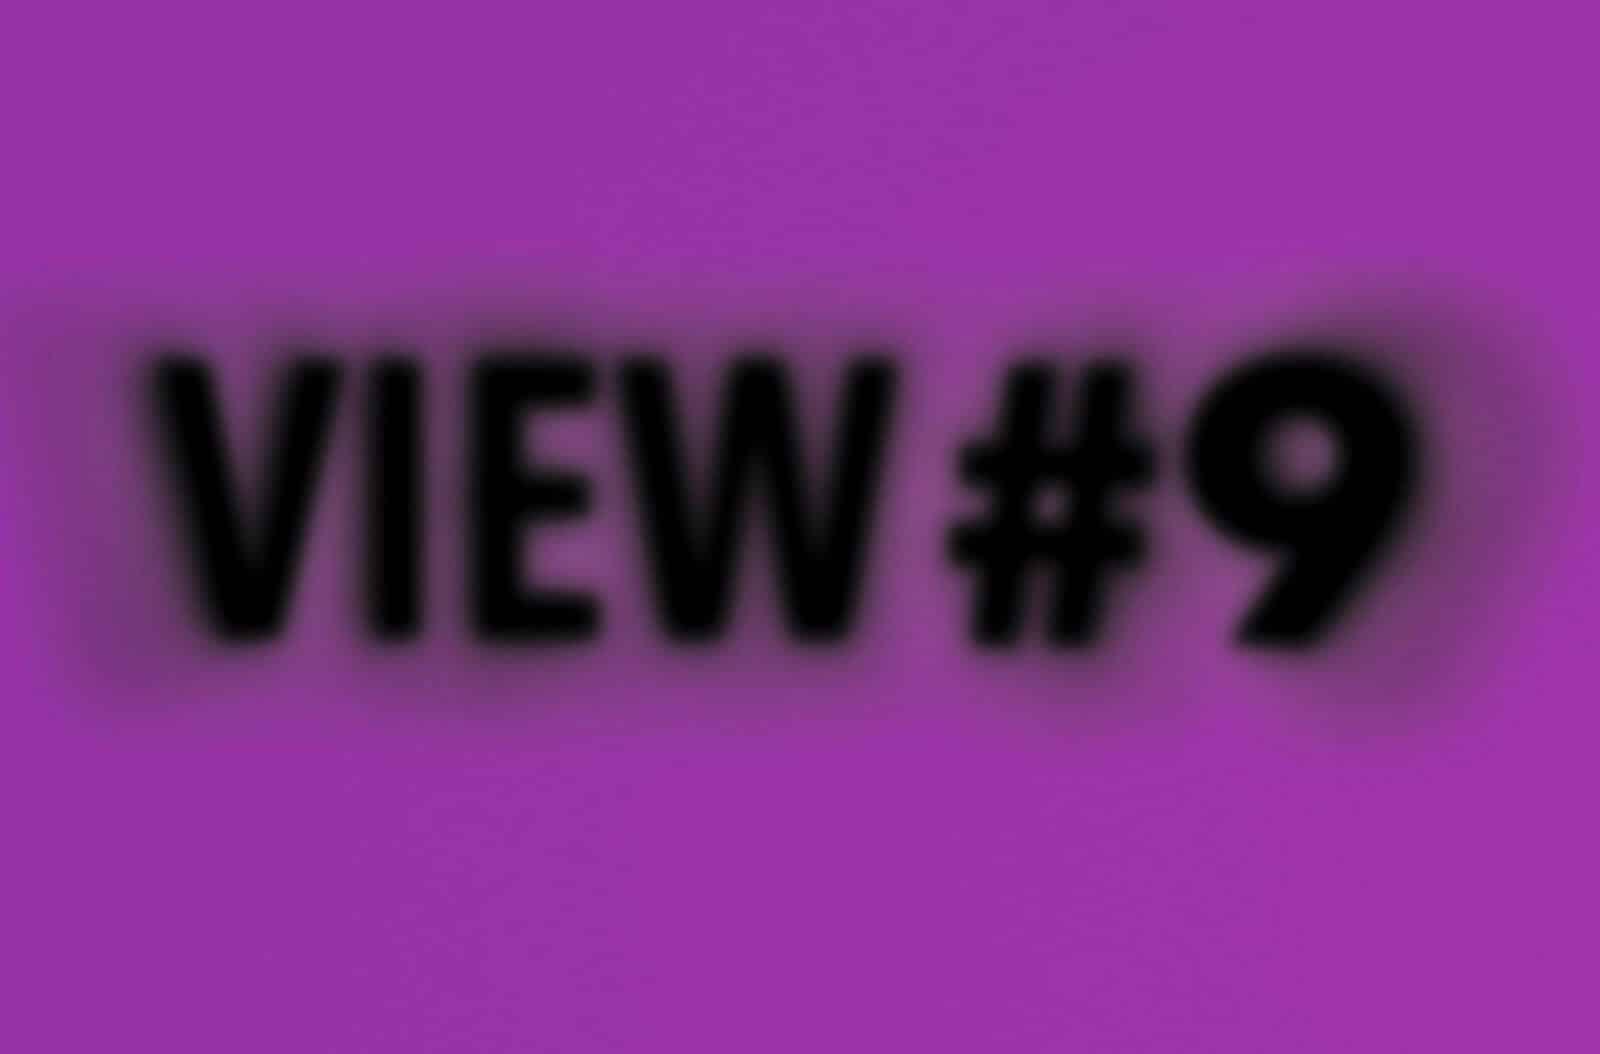 Titelbild VIEW #9